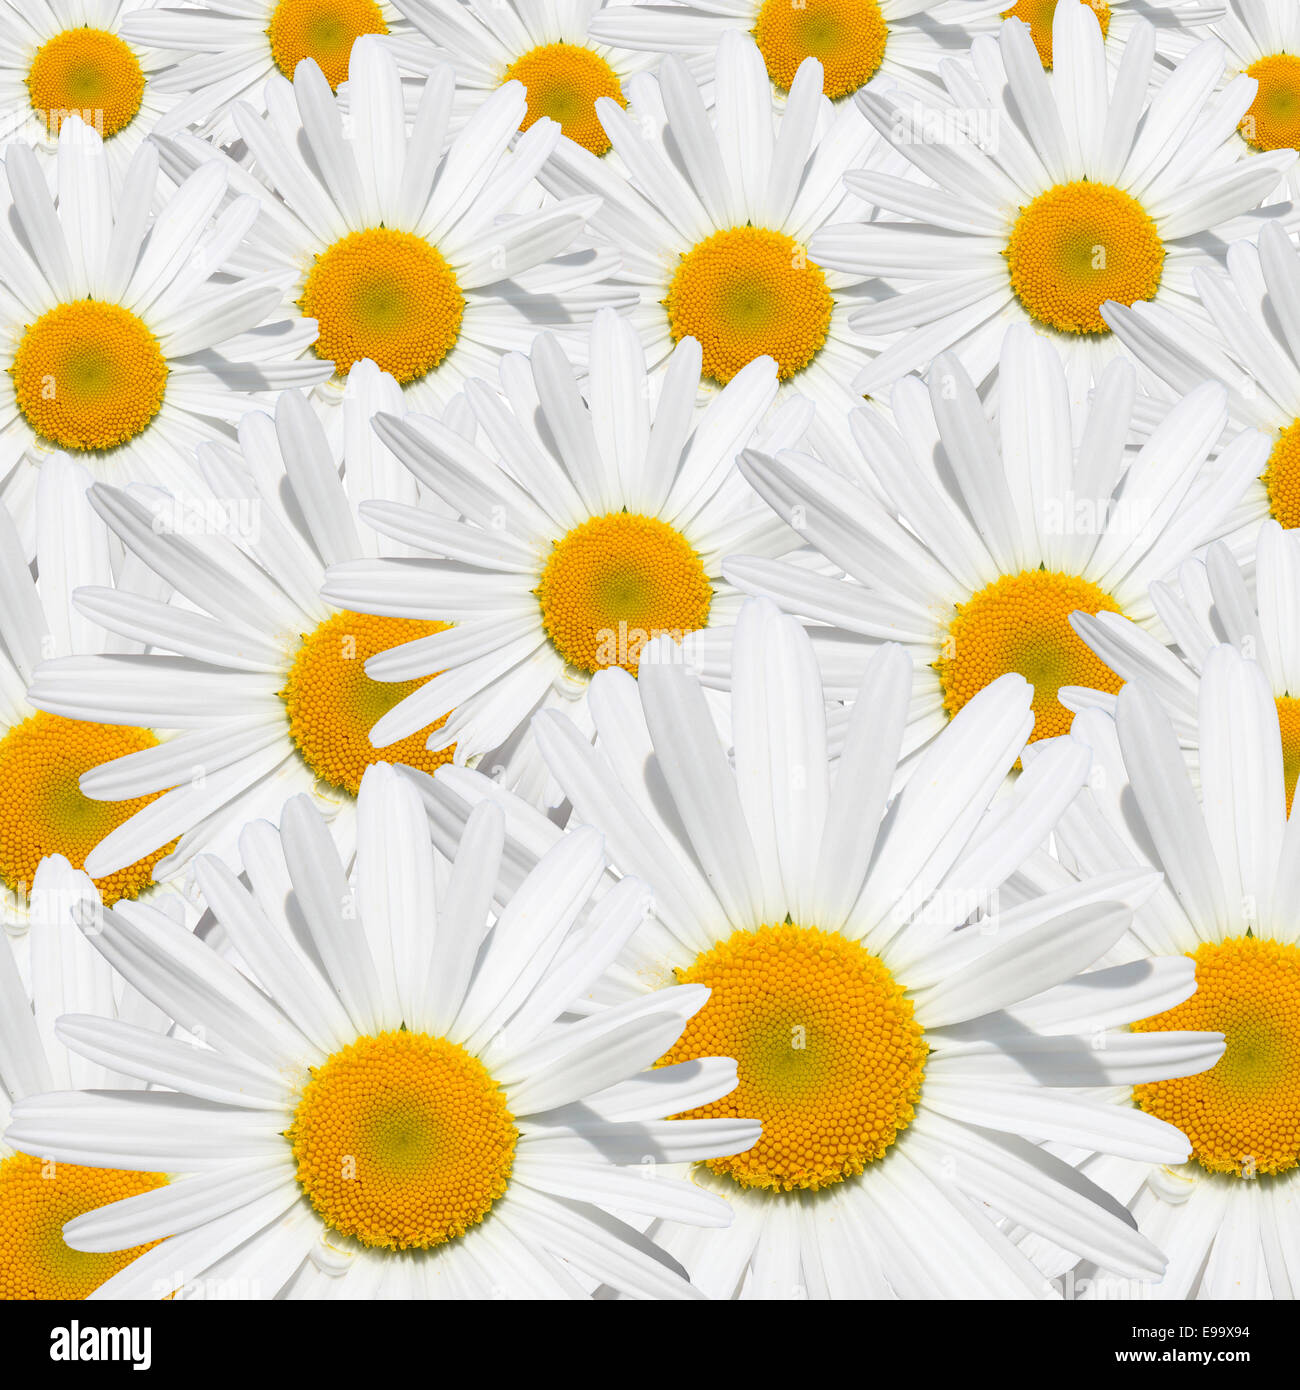 Daisy flower texture - Stock Image